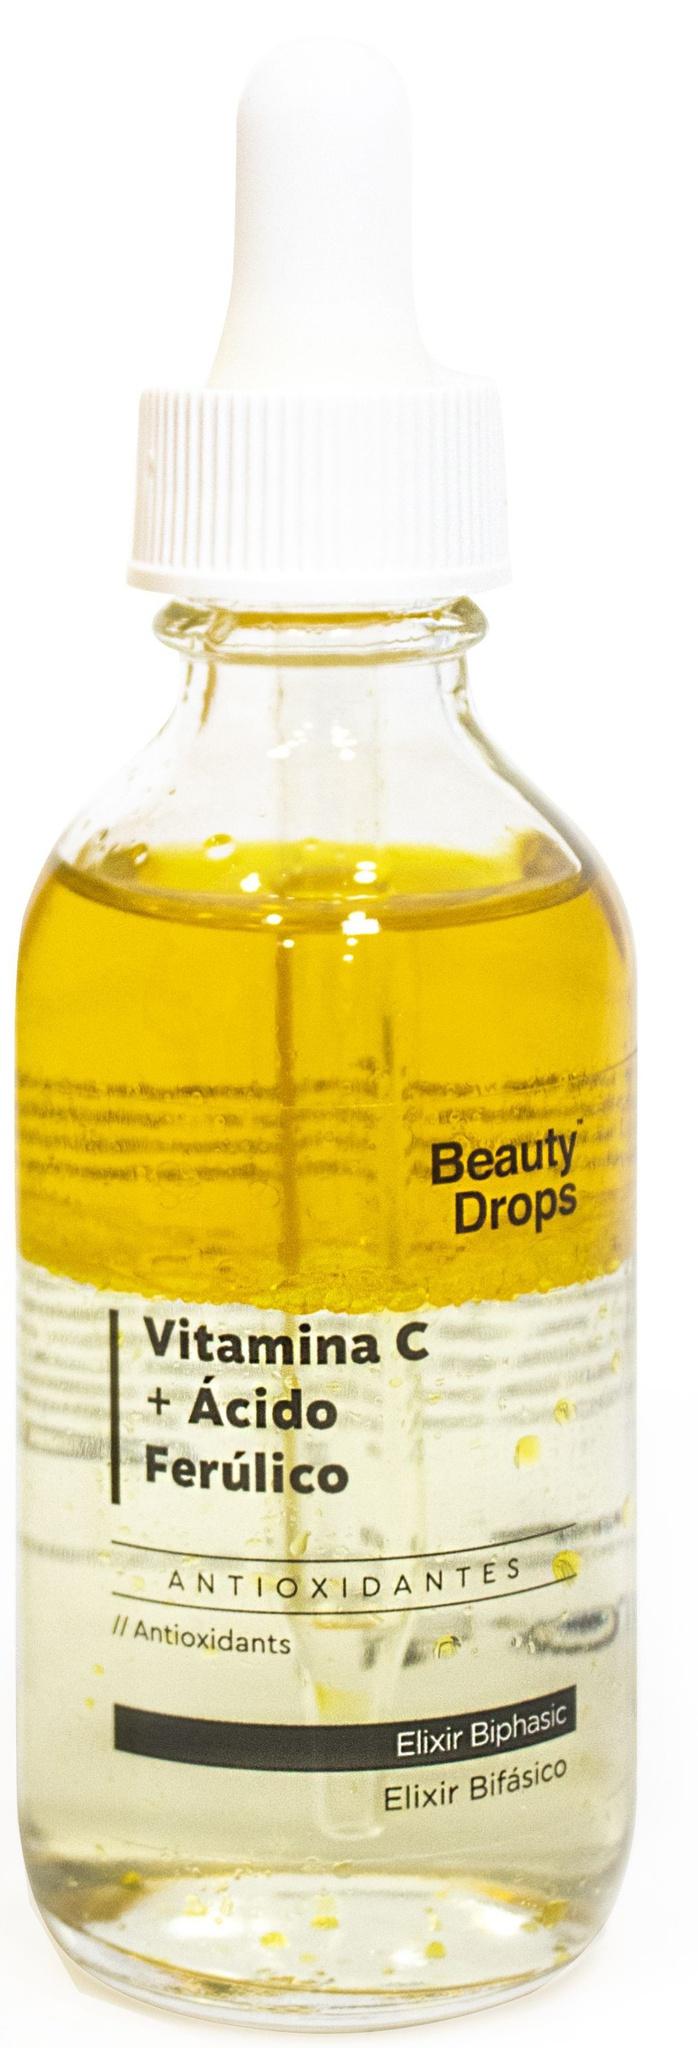 Beauty Drops Vitamina C + Ácido Ferúlico Elixir Bifásico